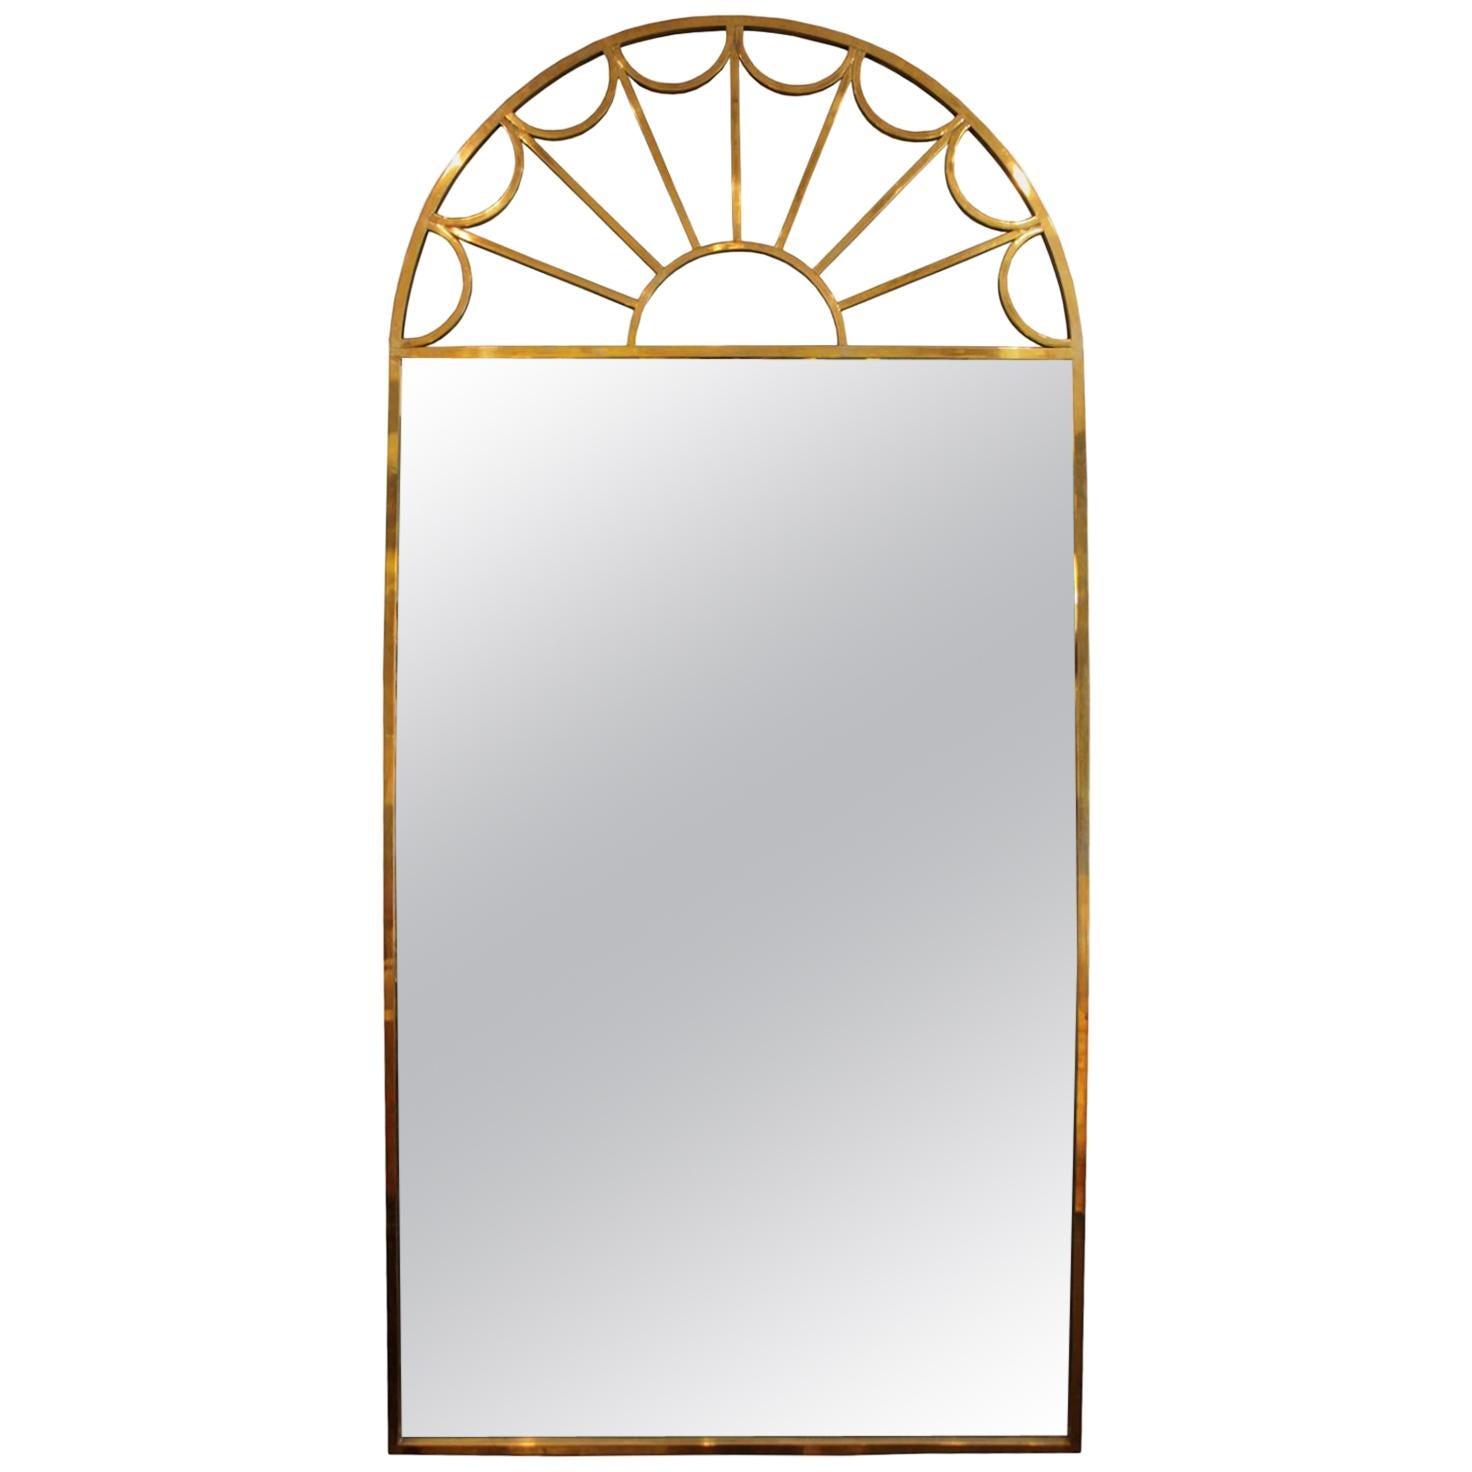 Mastercraft Brass Palladian Wall Mirror